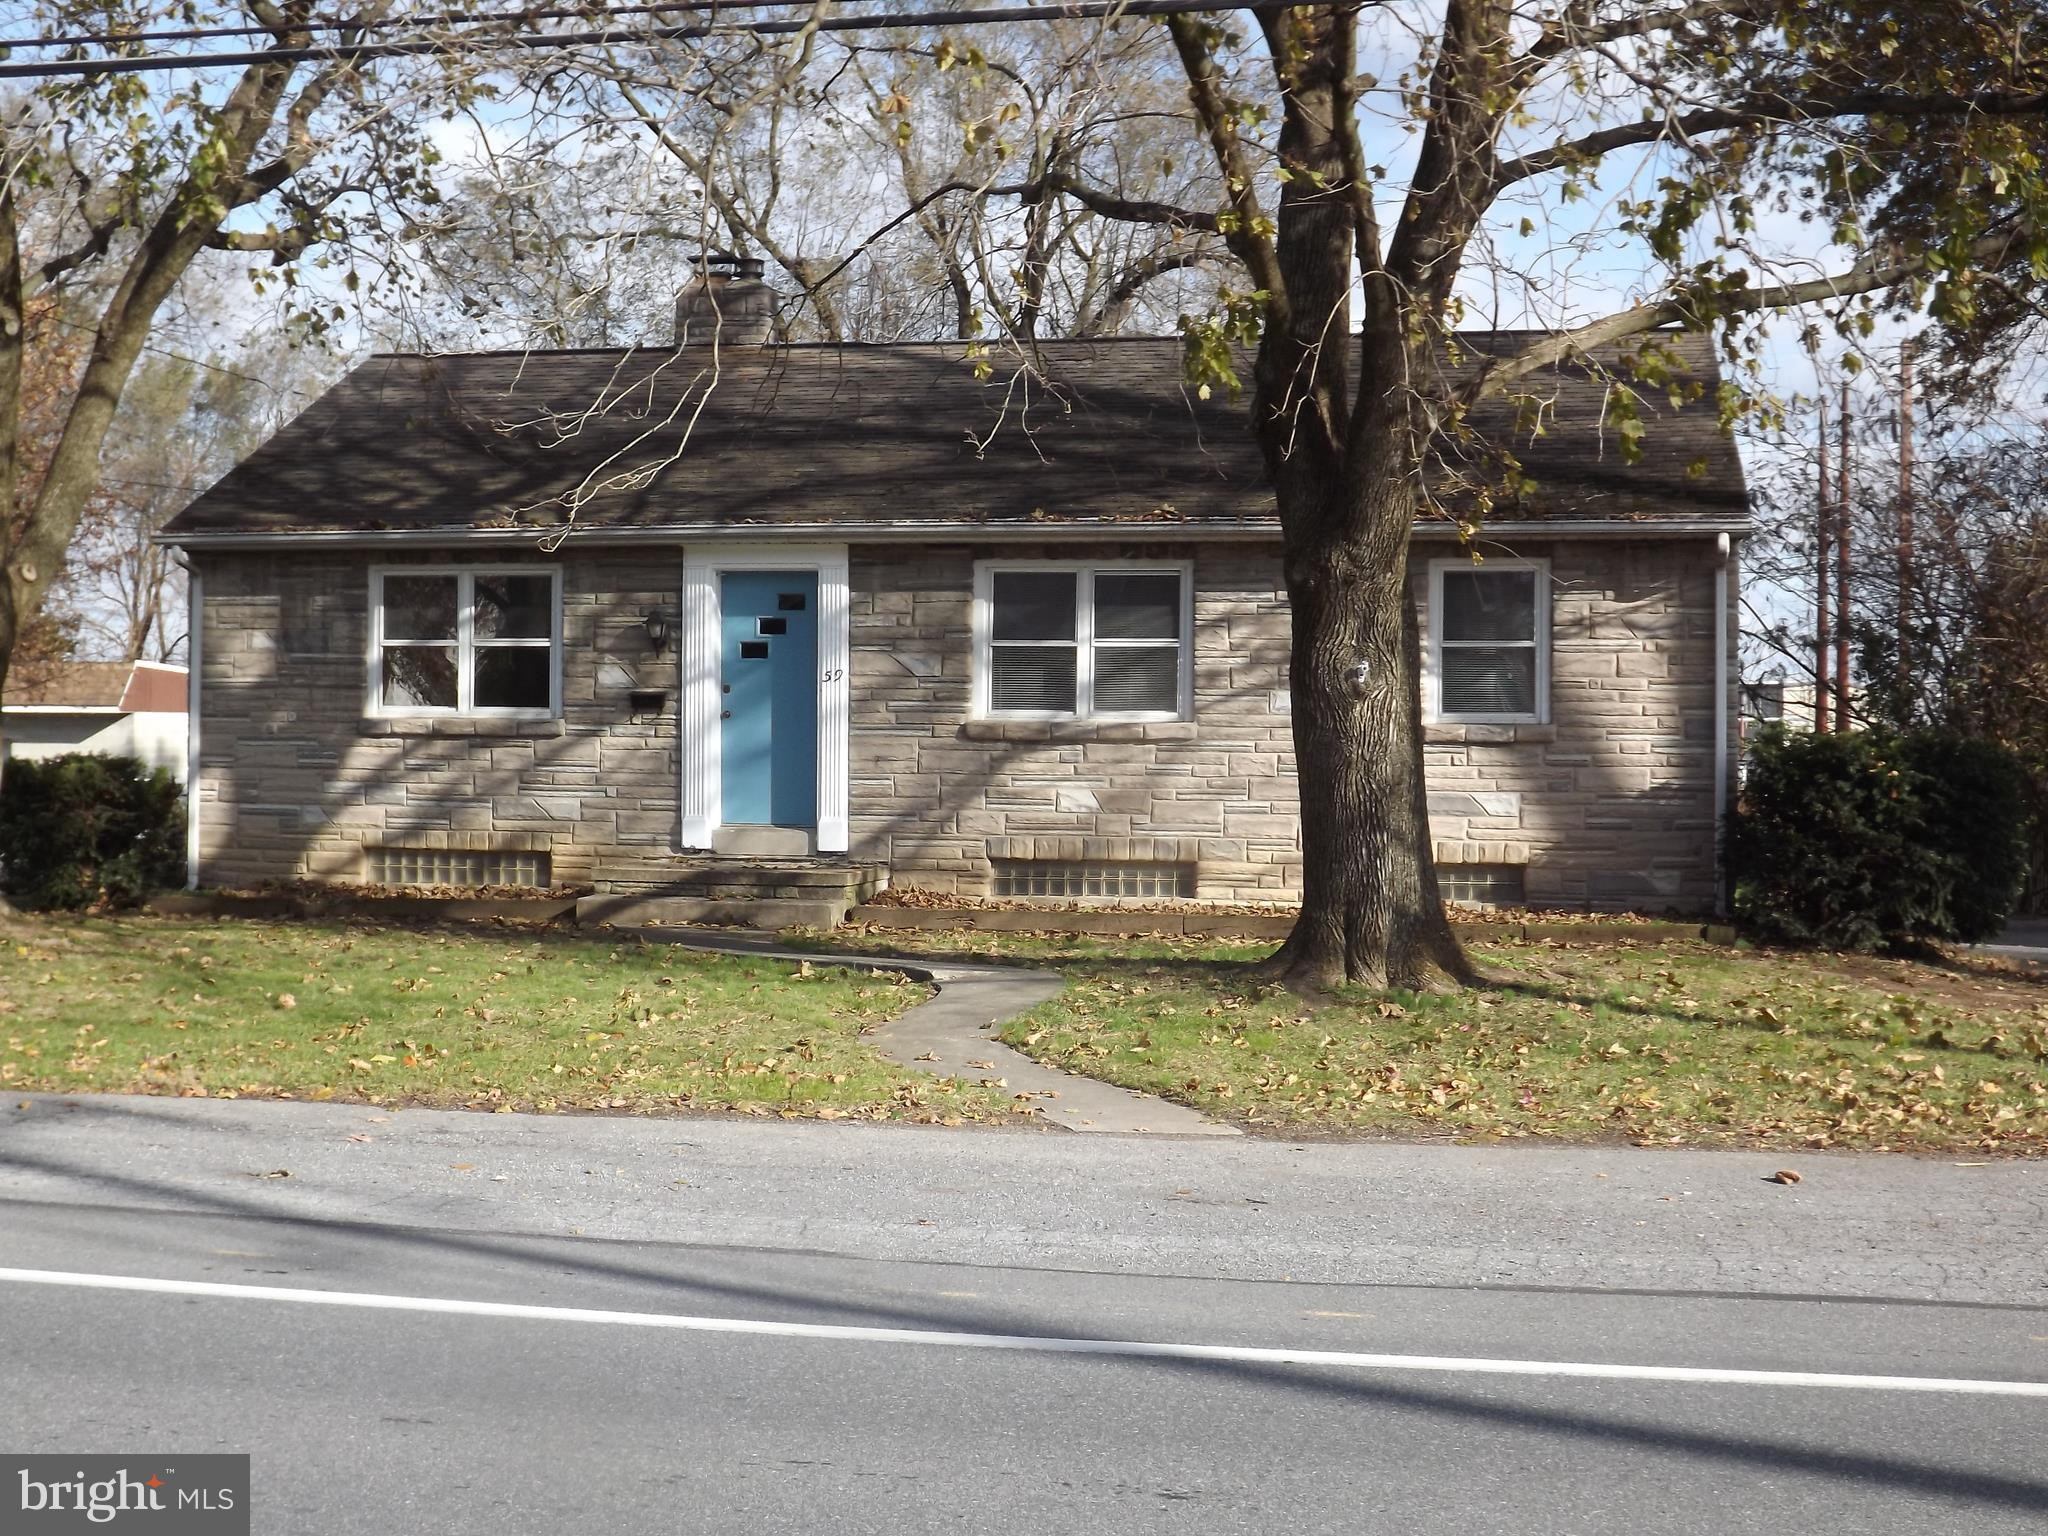 59 W MAIN STREET, LANDISVILLE, PA 17538